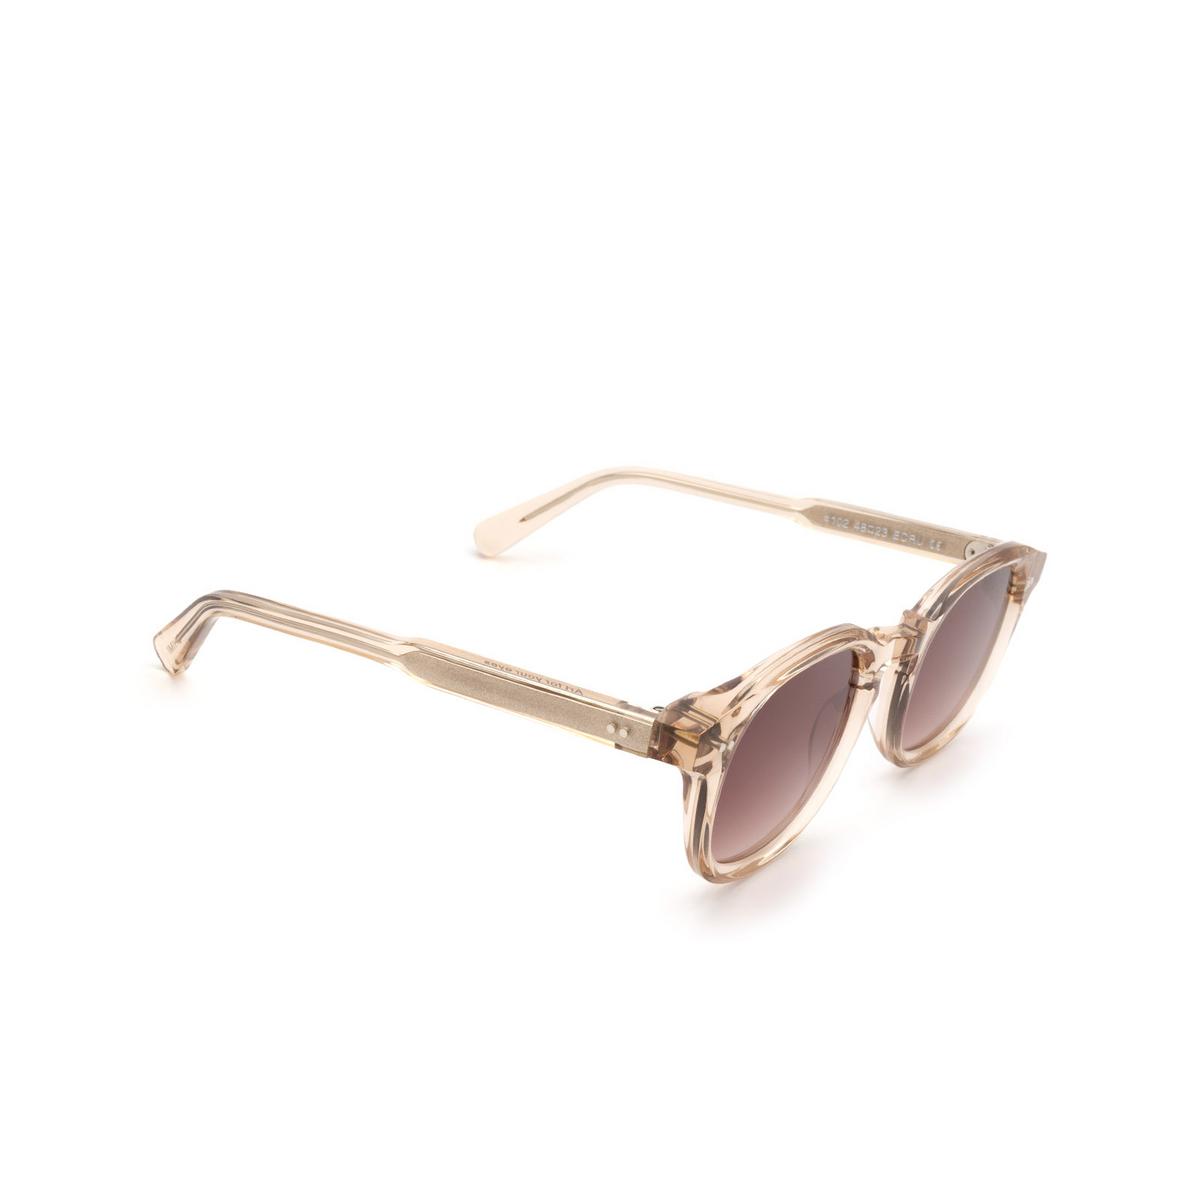 Chimi® Square Sunglasses: #102 color Light Beige Ecru - three-quarters view.